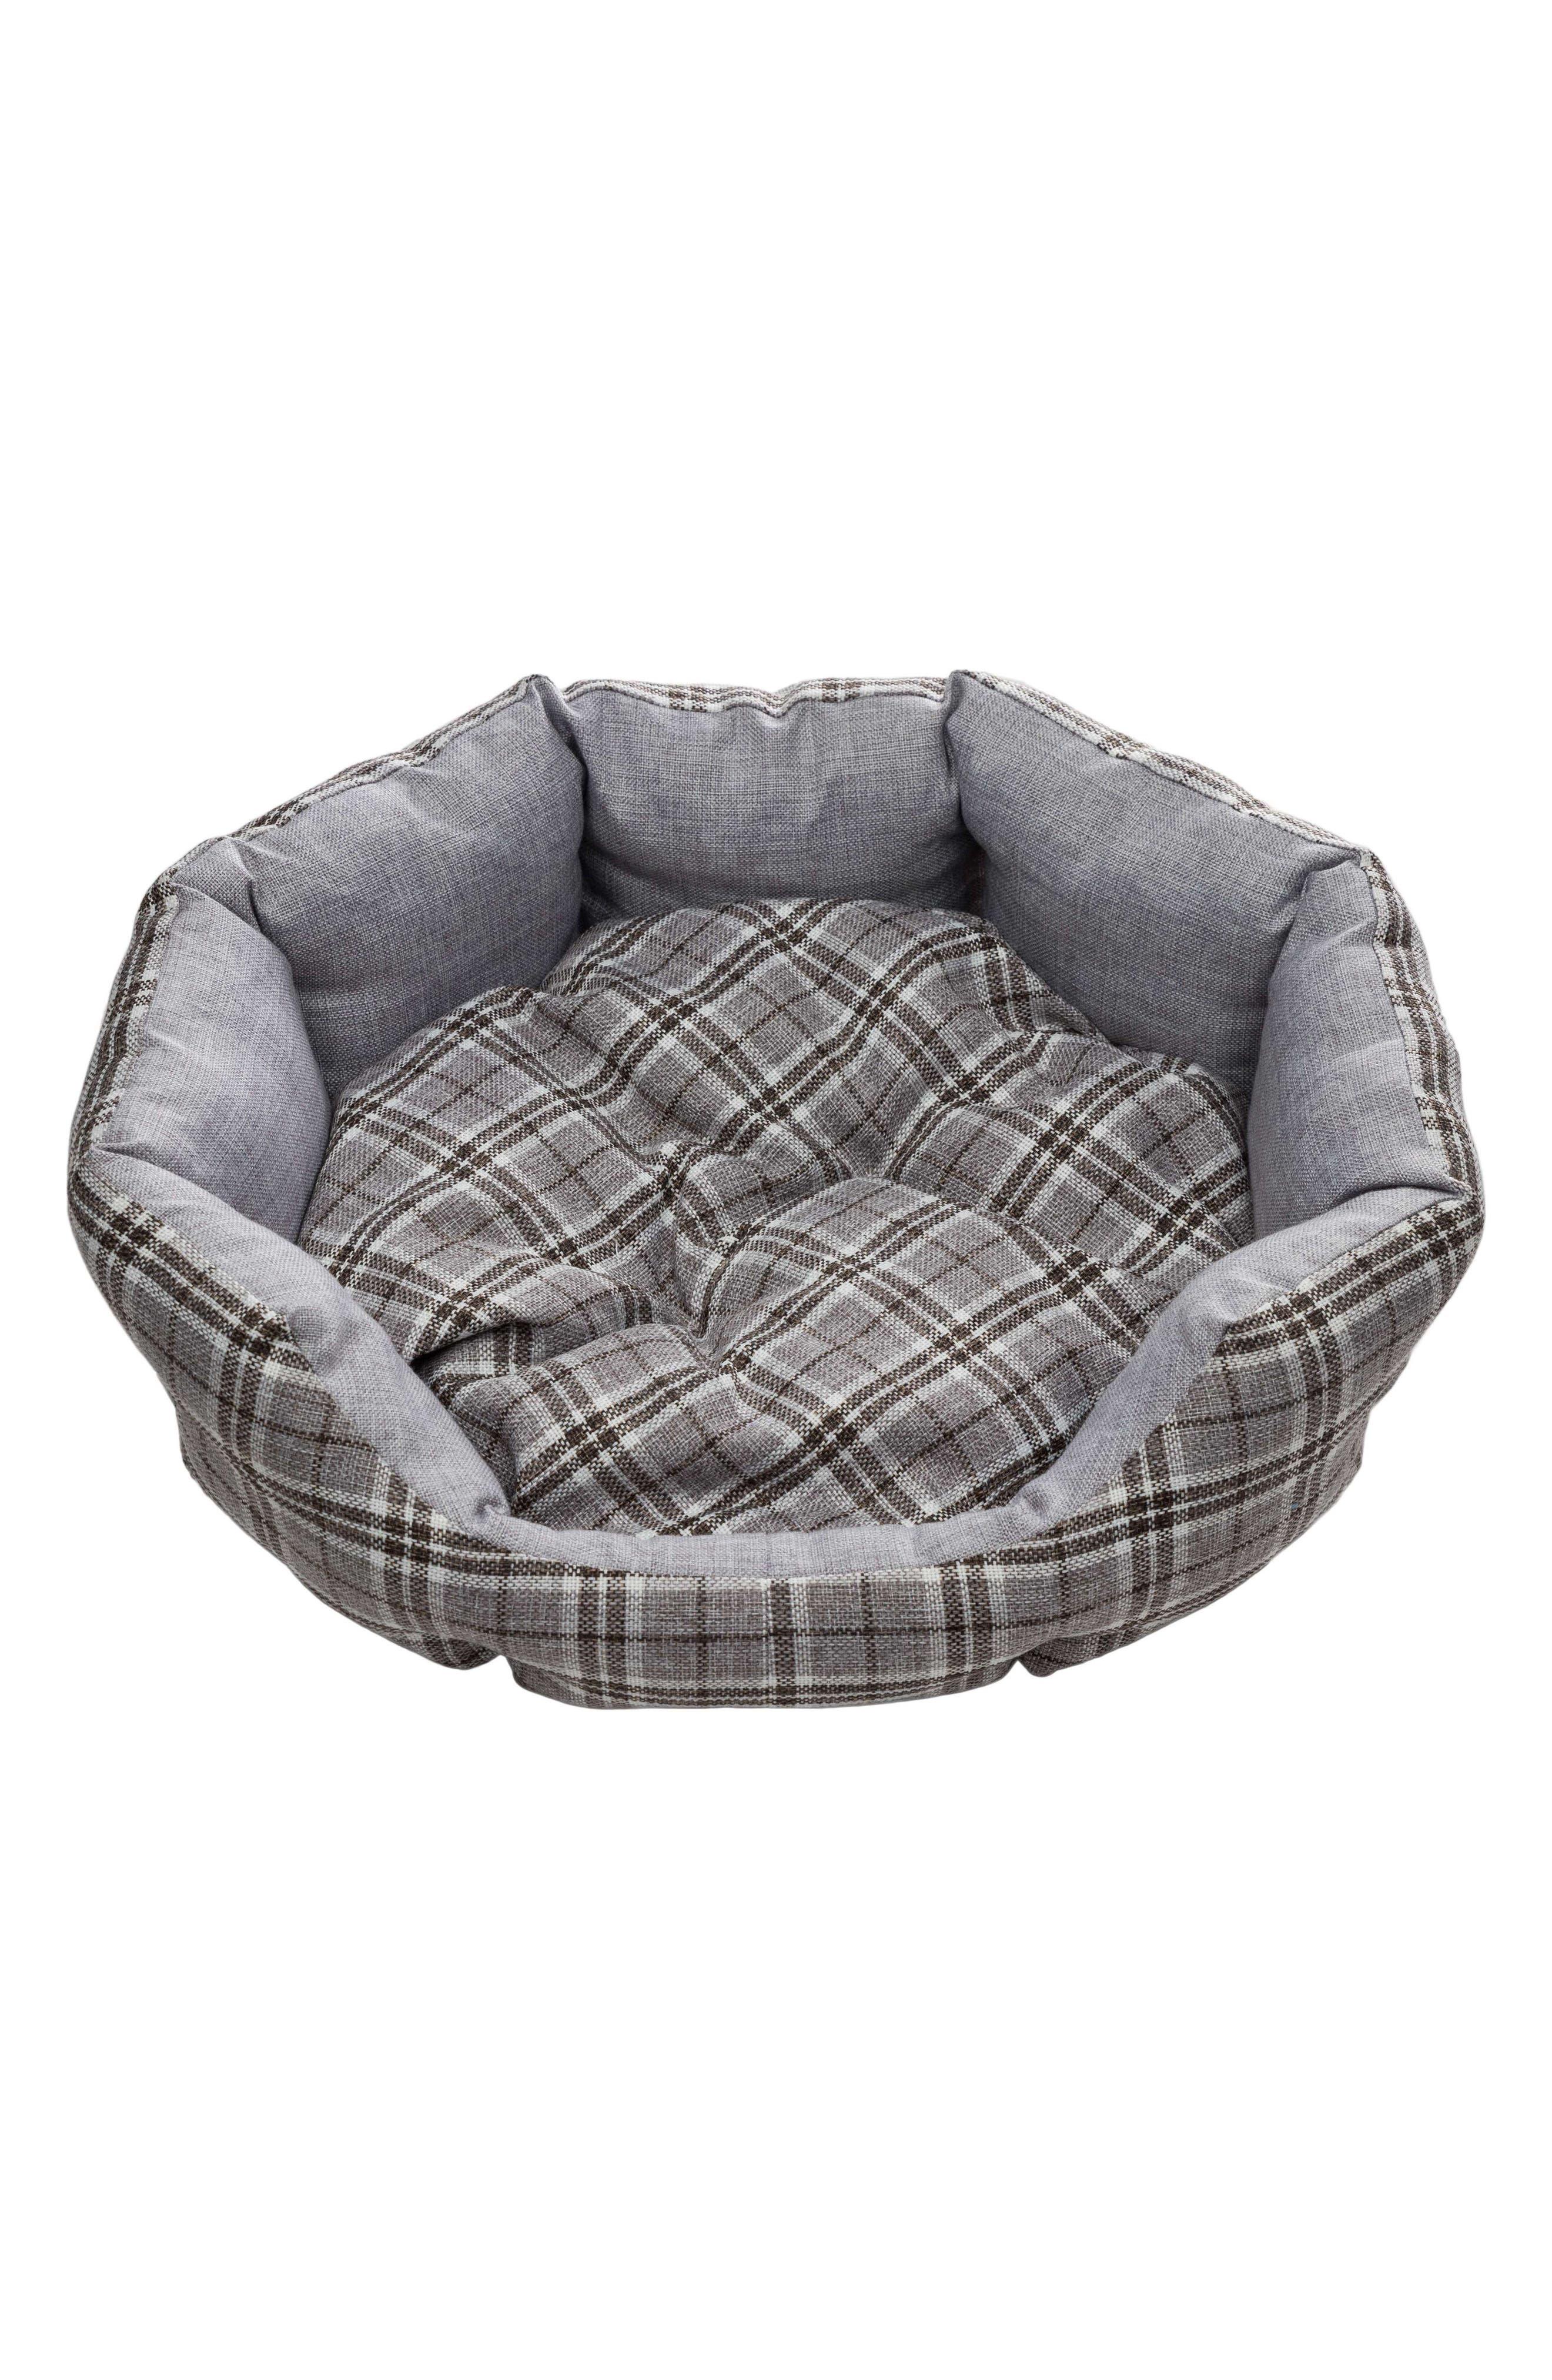 Harlee Round Pet Bed,                             Main thumbnail 1, color,                             Grey